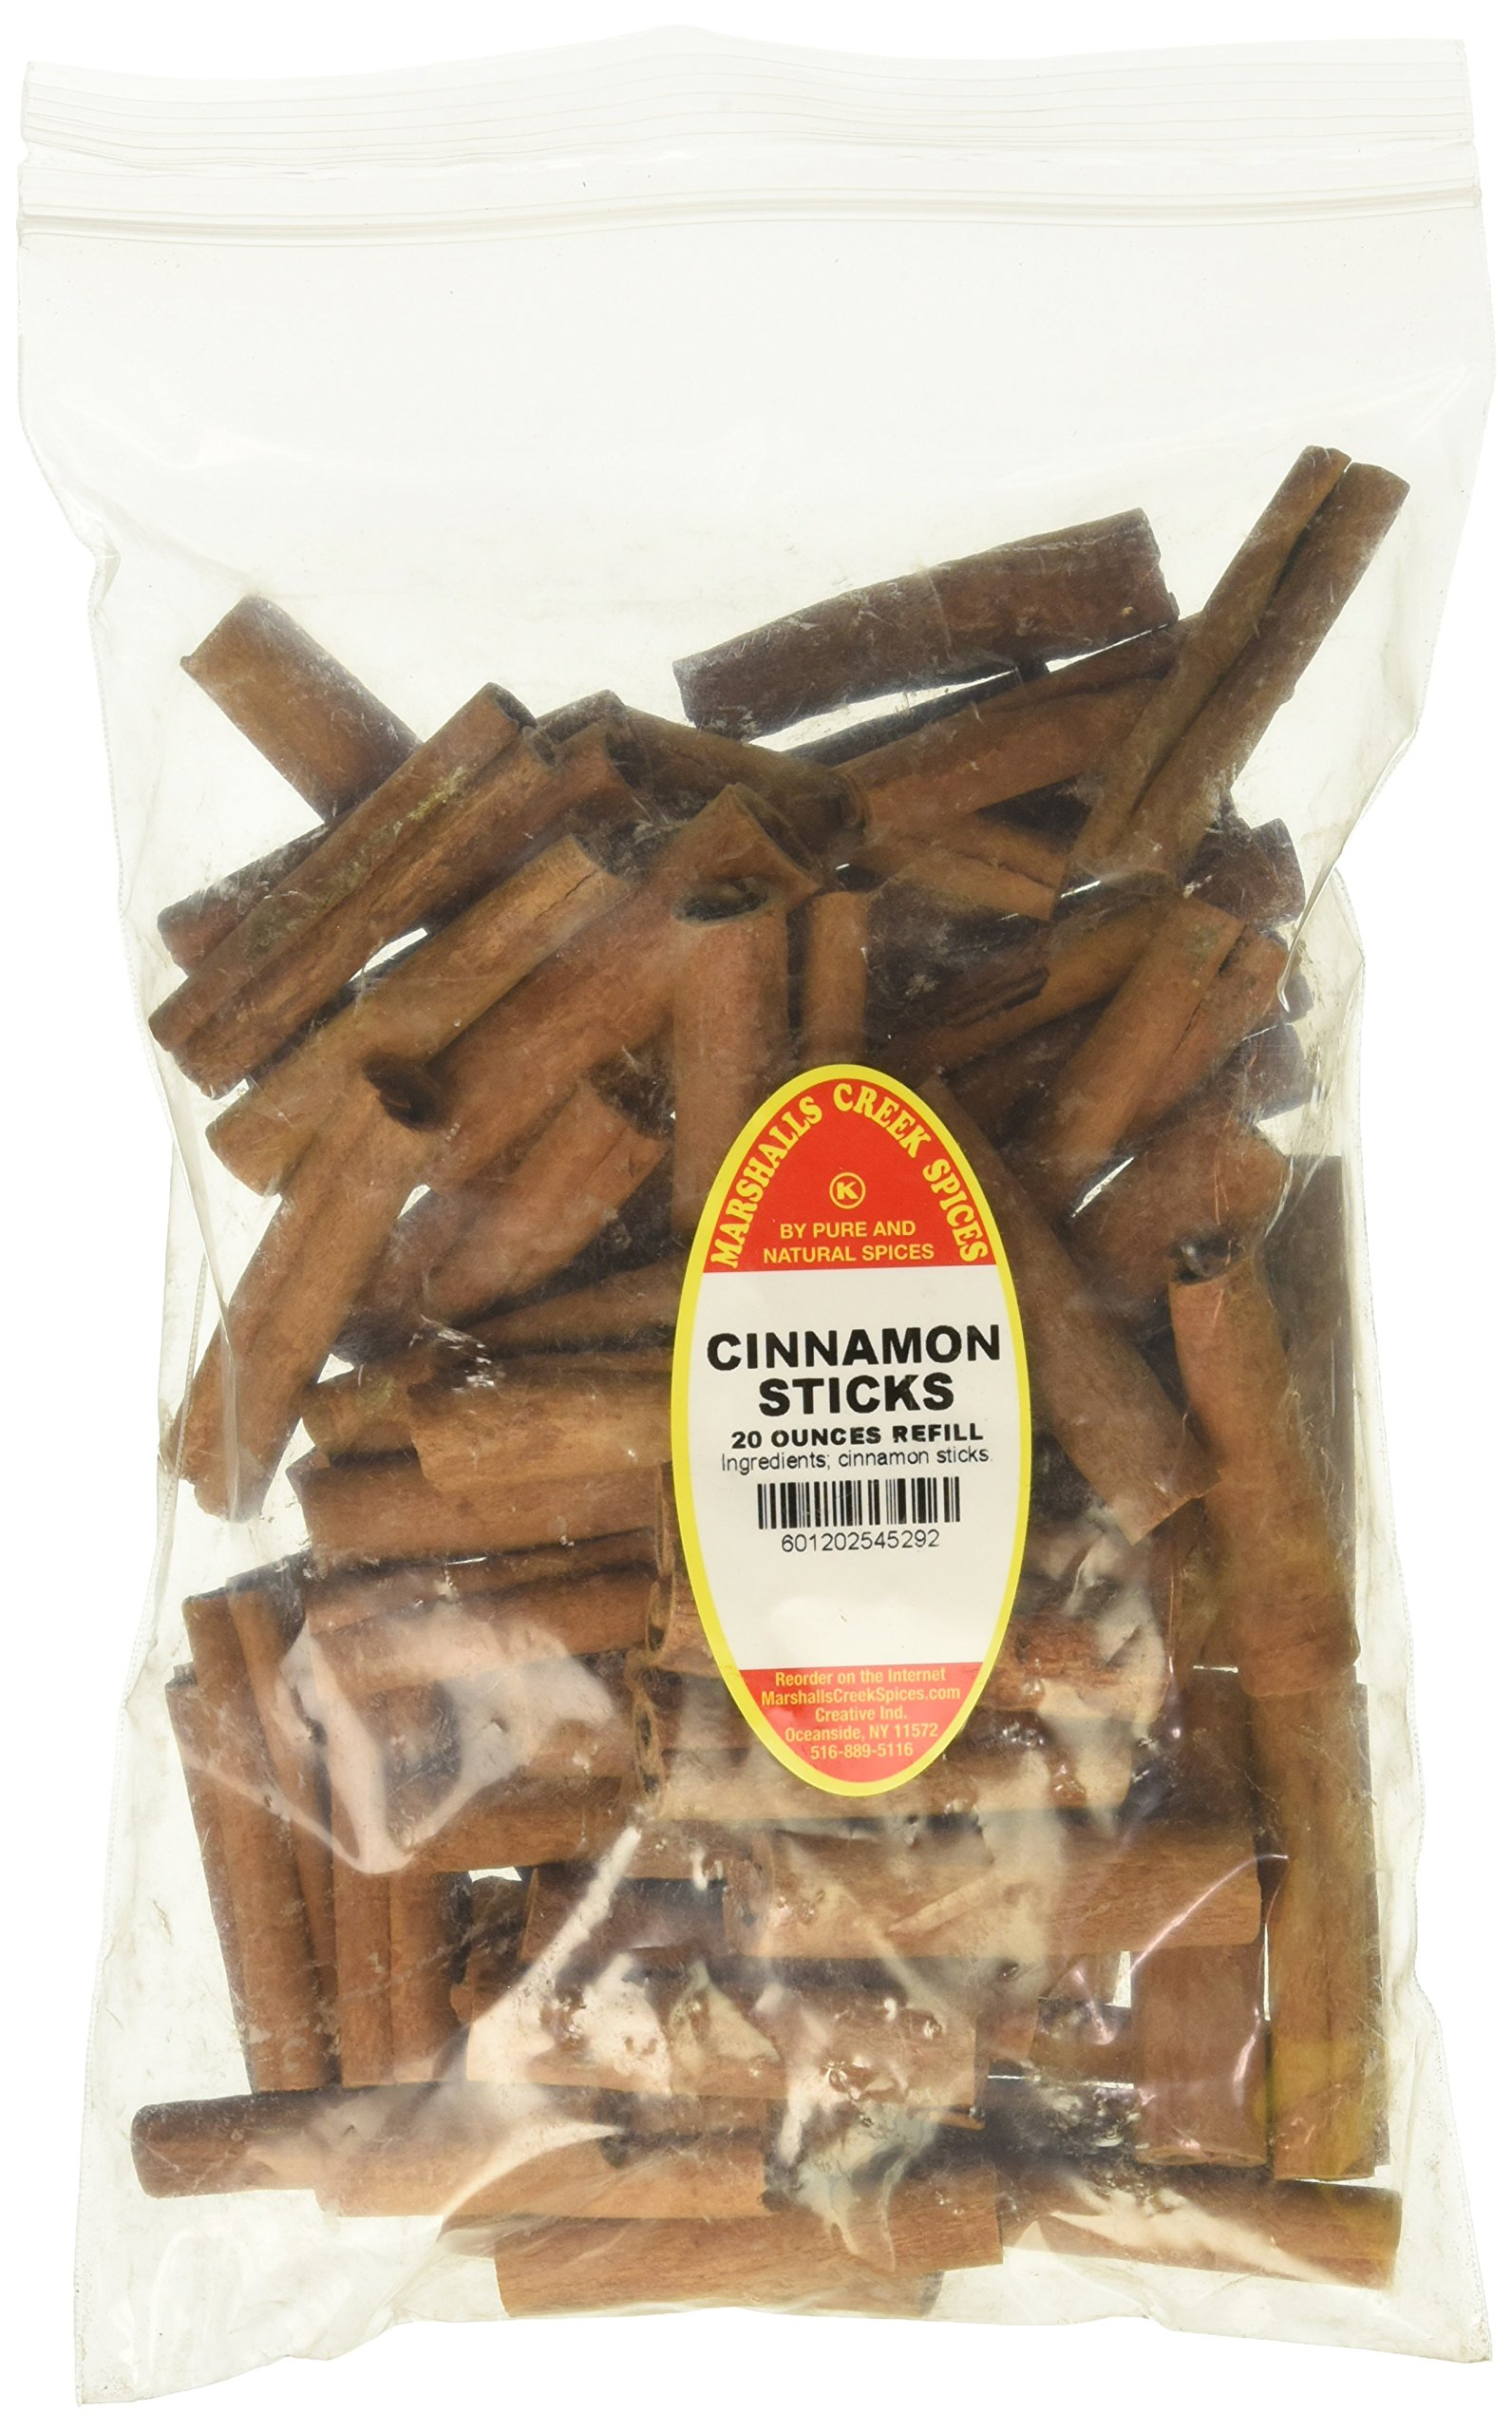 Marshalls Creek Spices Family Size Kosher Cinnamon Sticks Refill, 20 Ounce